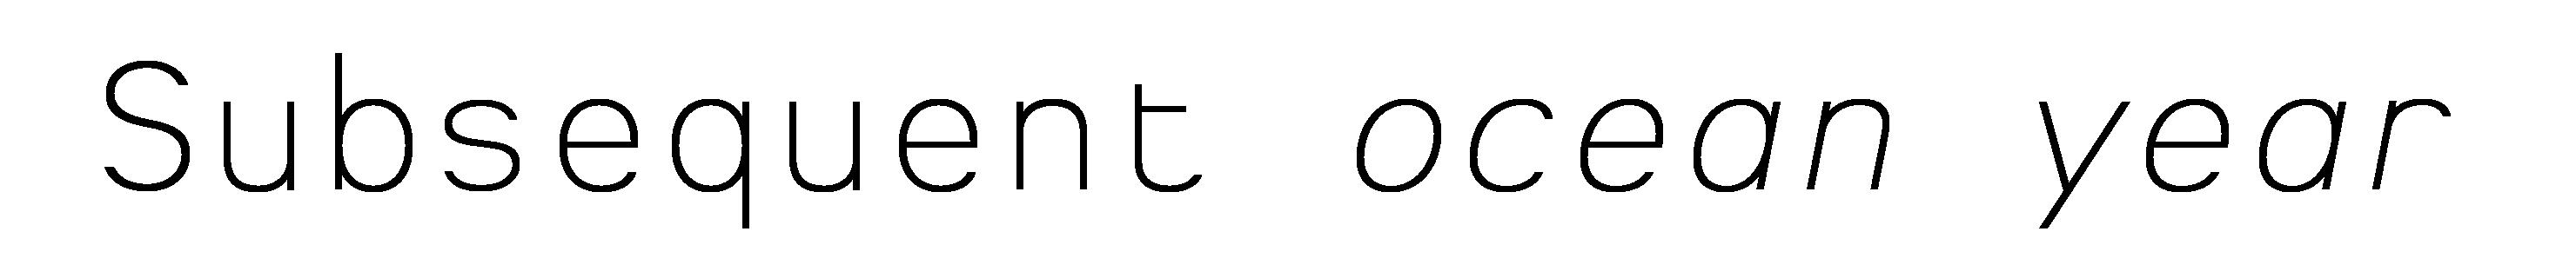 Typeface Heimat Mono D07 Atlas Font Foundry